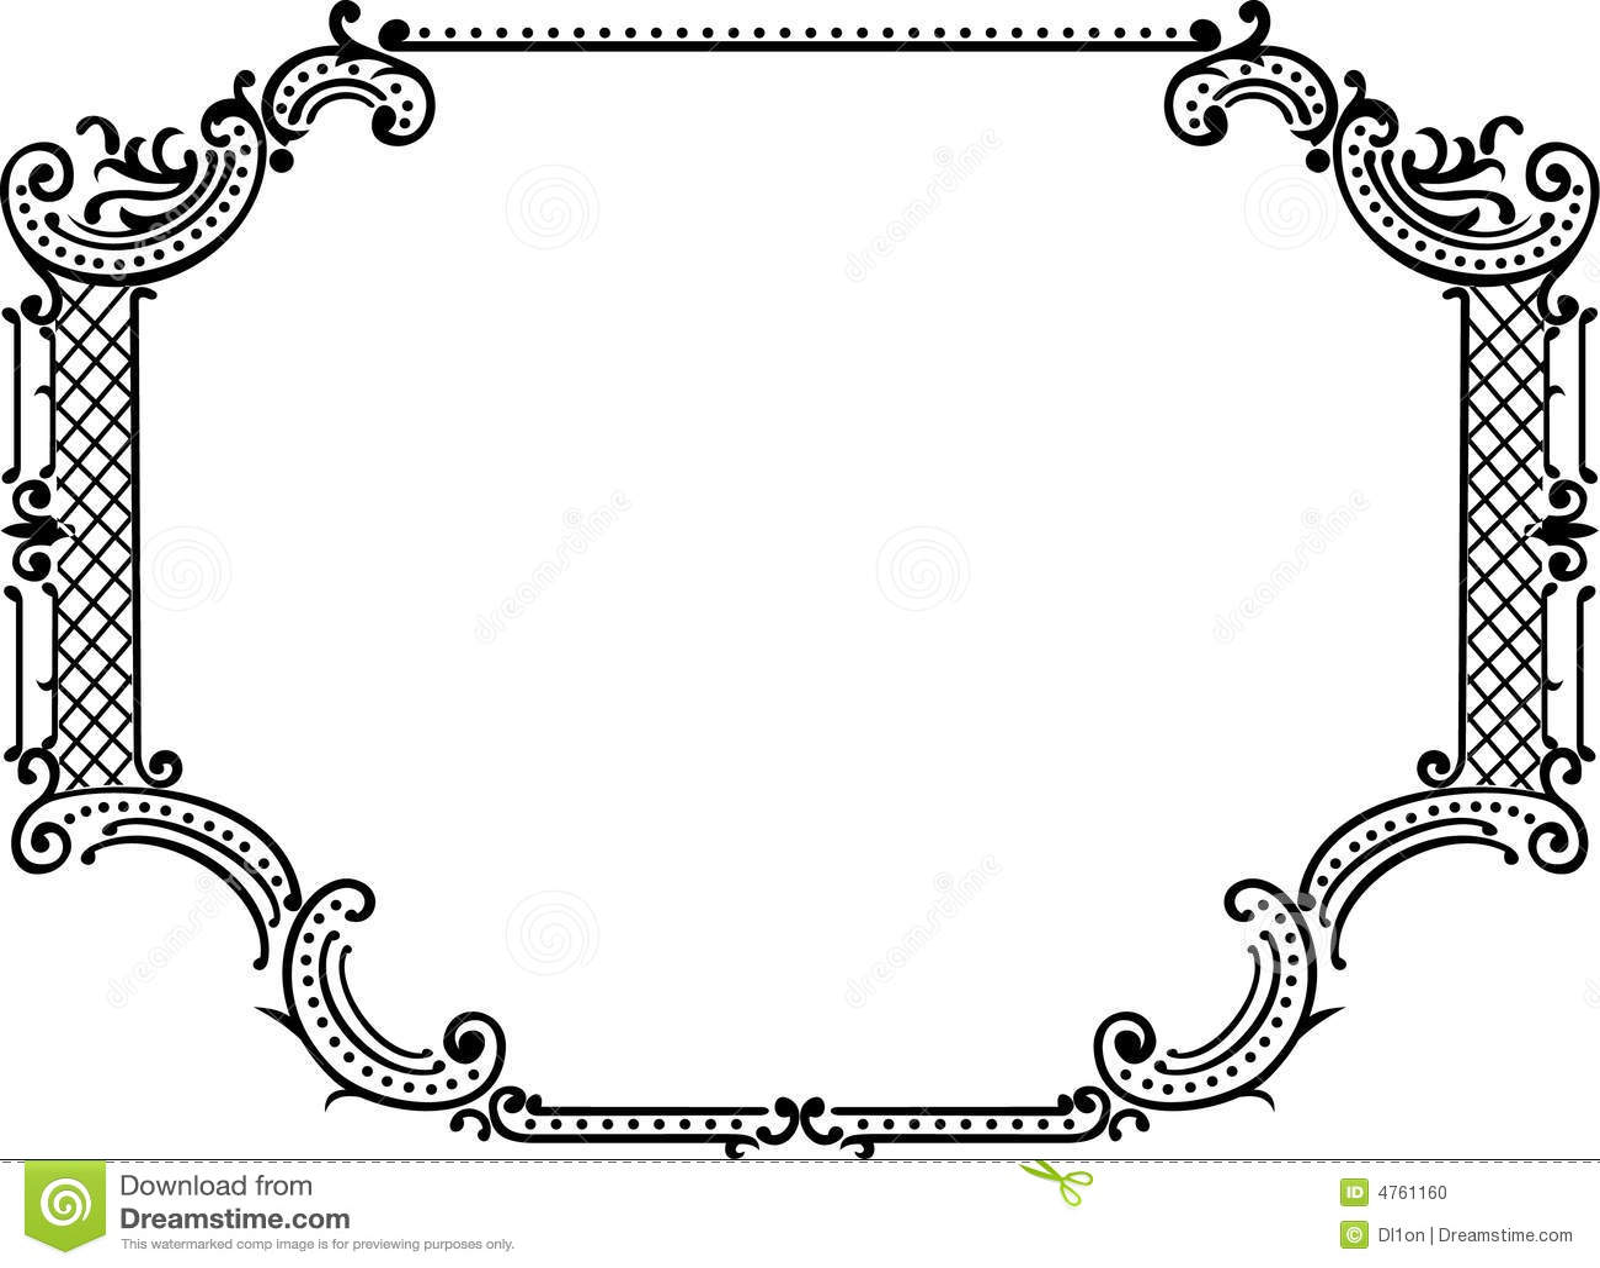 Cool Graphic Design Frame